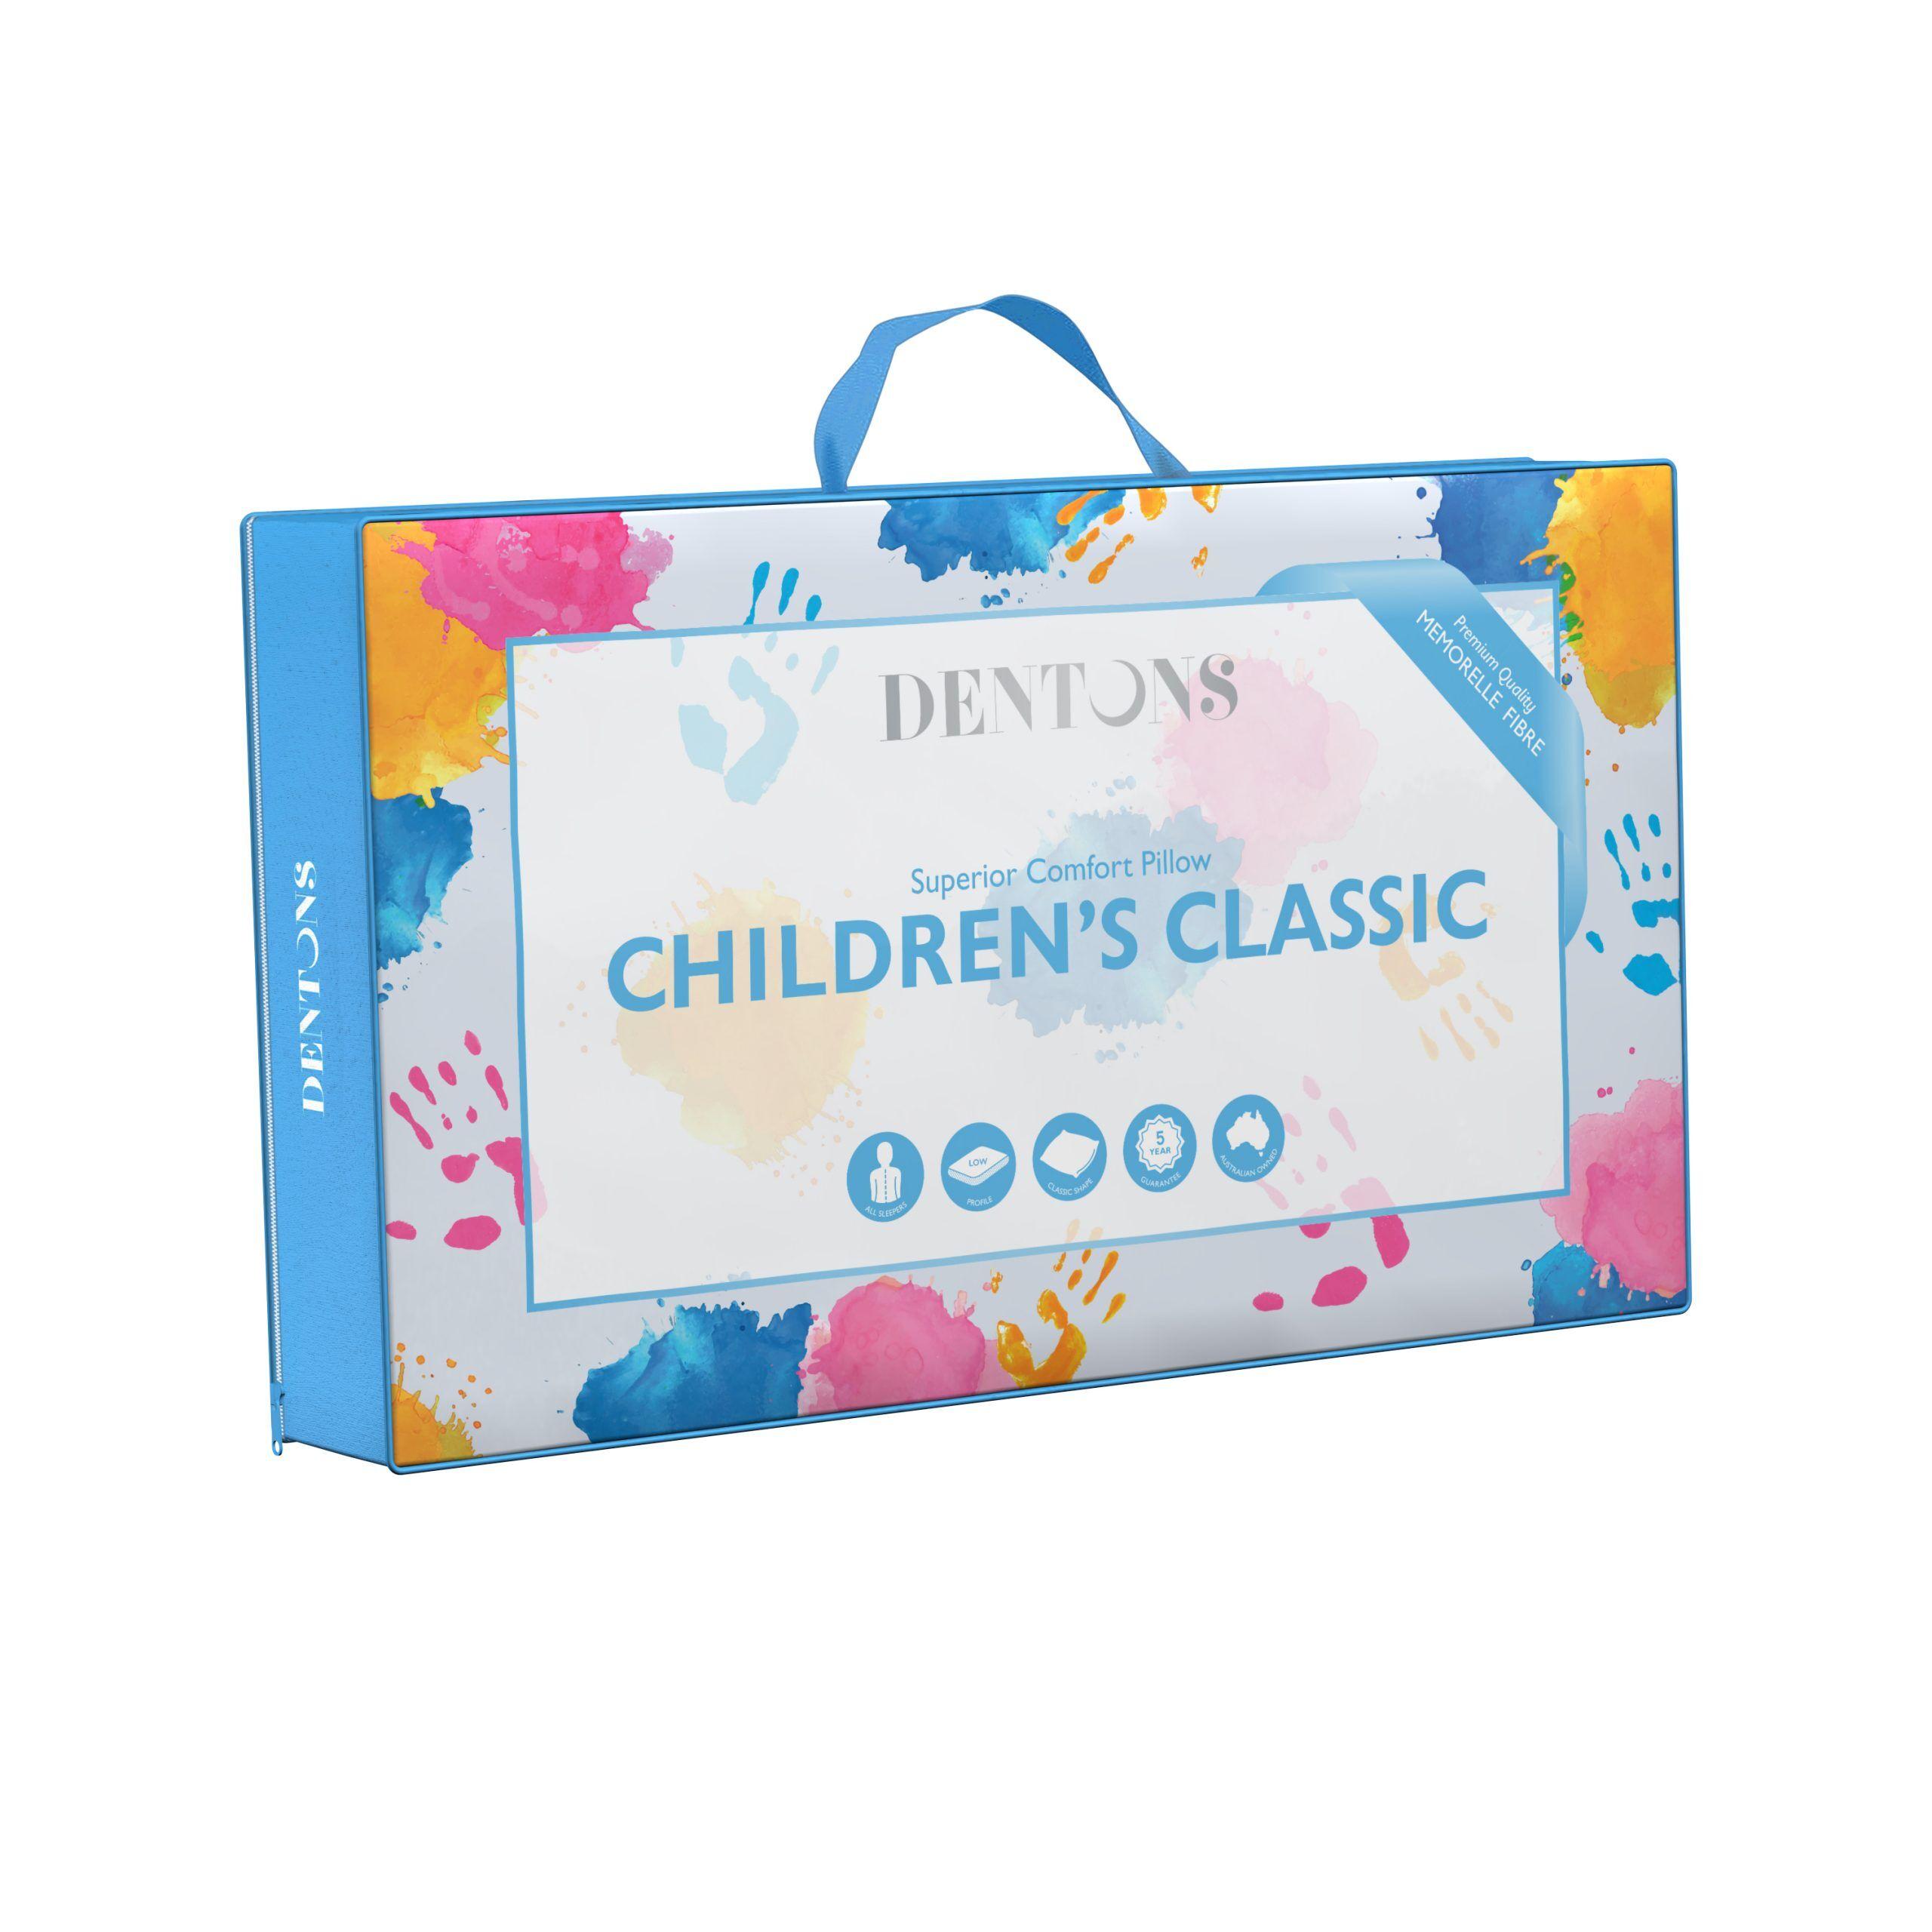 Dentons Children's Classic